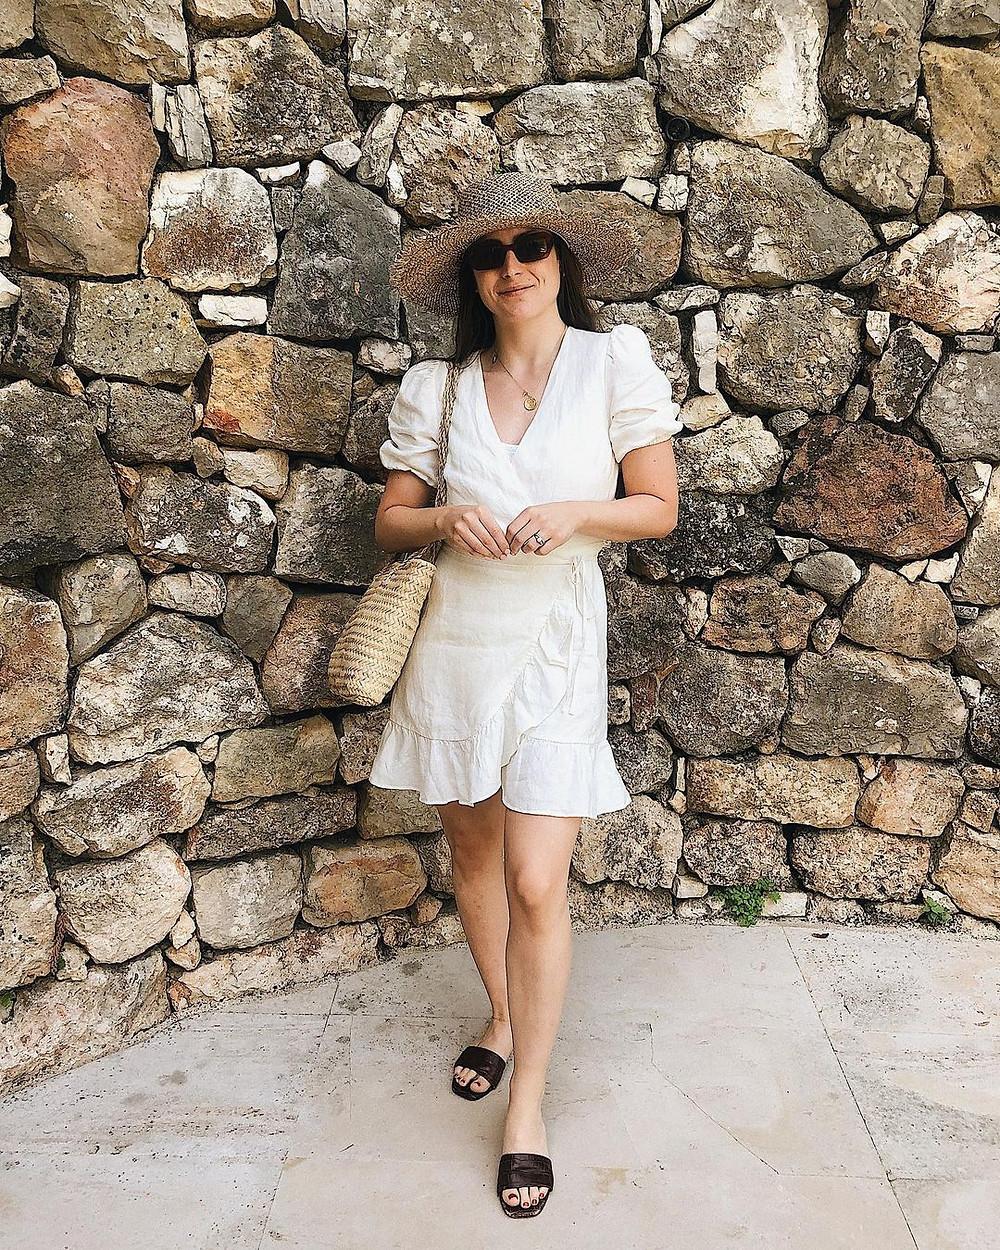 emily dawes wears a white linen dress in france